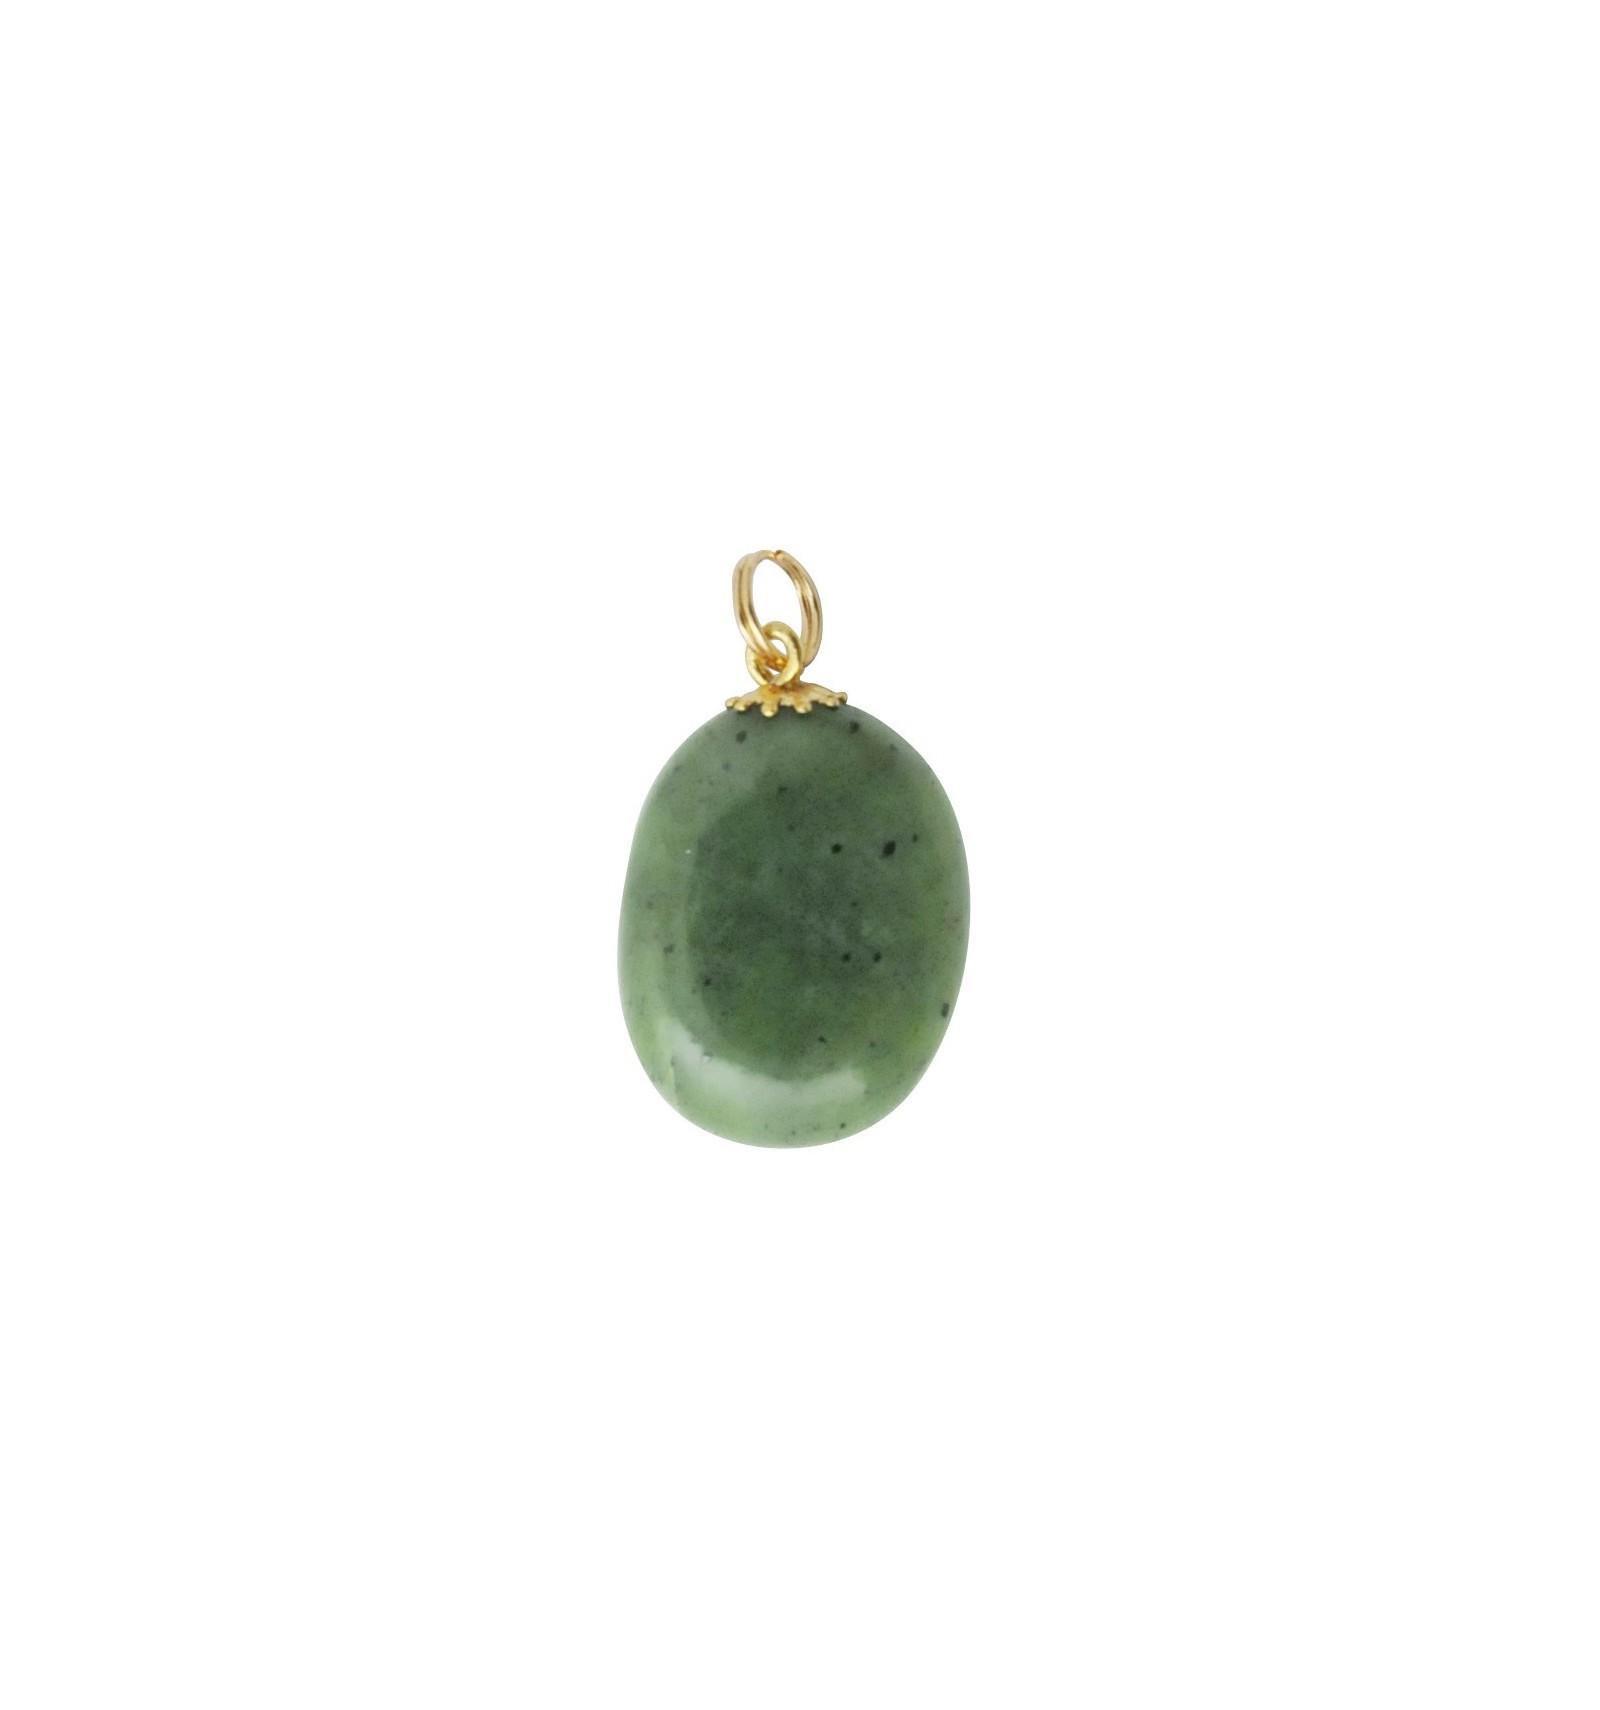 Nephrite jade pendant aloadofball Choice Image